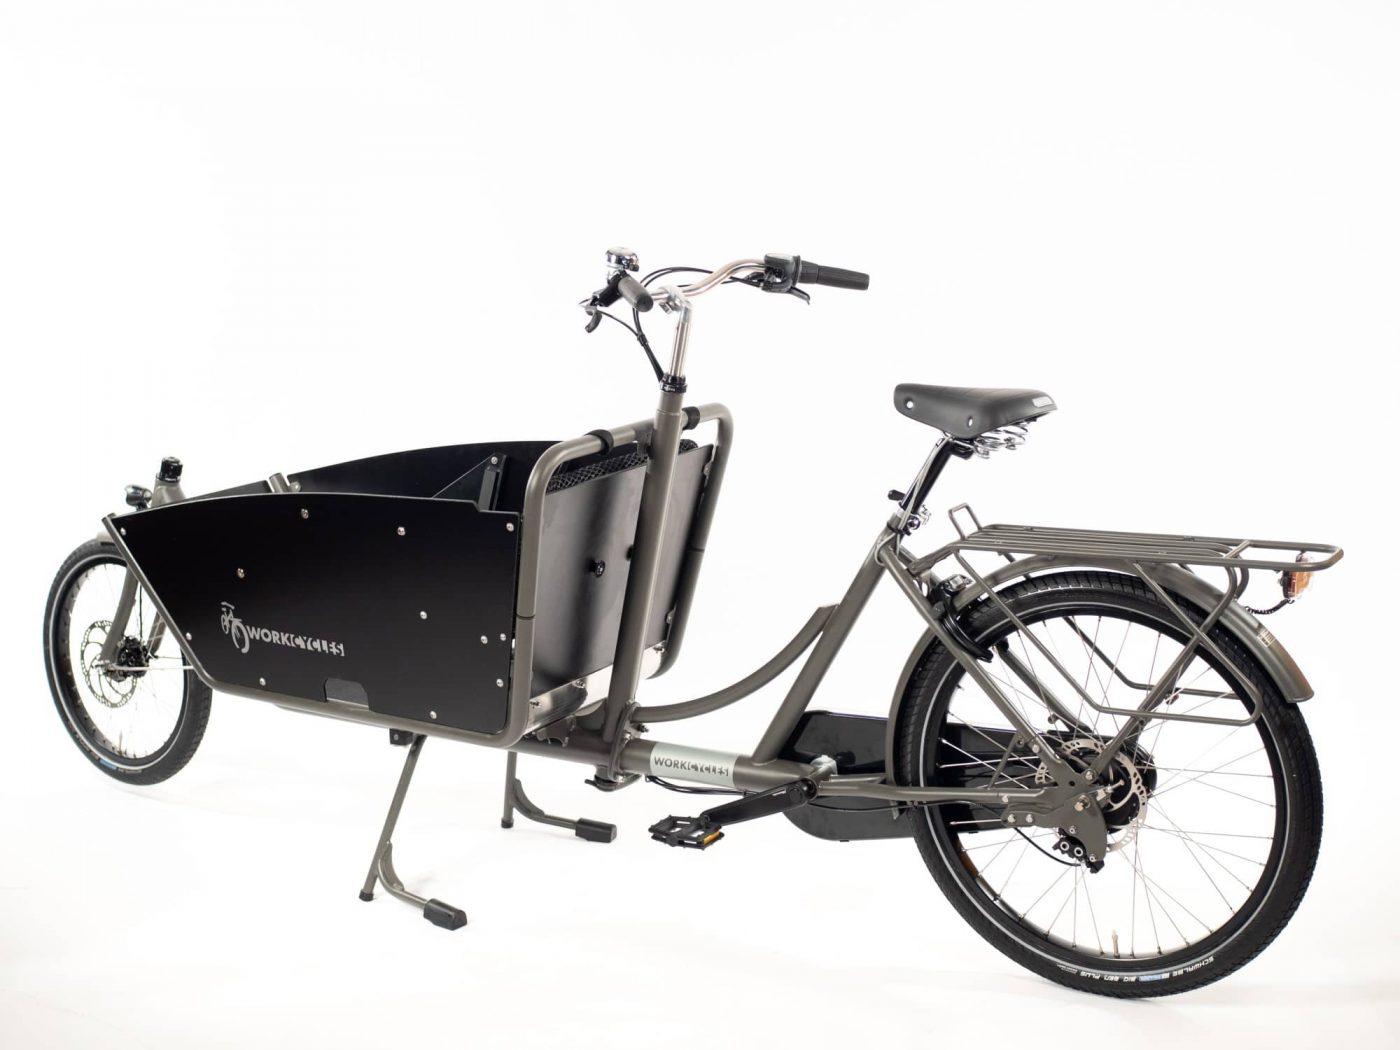 WorkCycles Kr8 bakfiets, child transport bike, dutch city bike